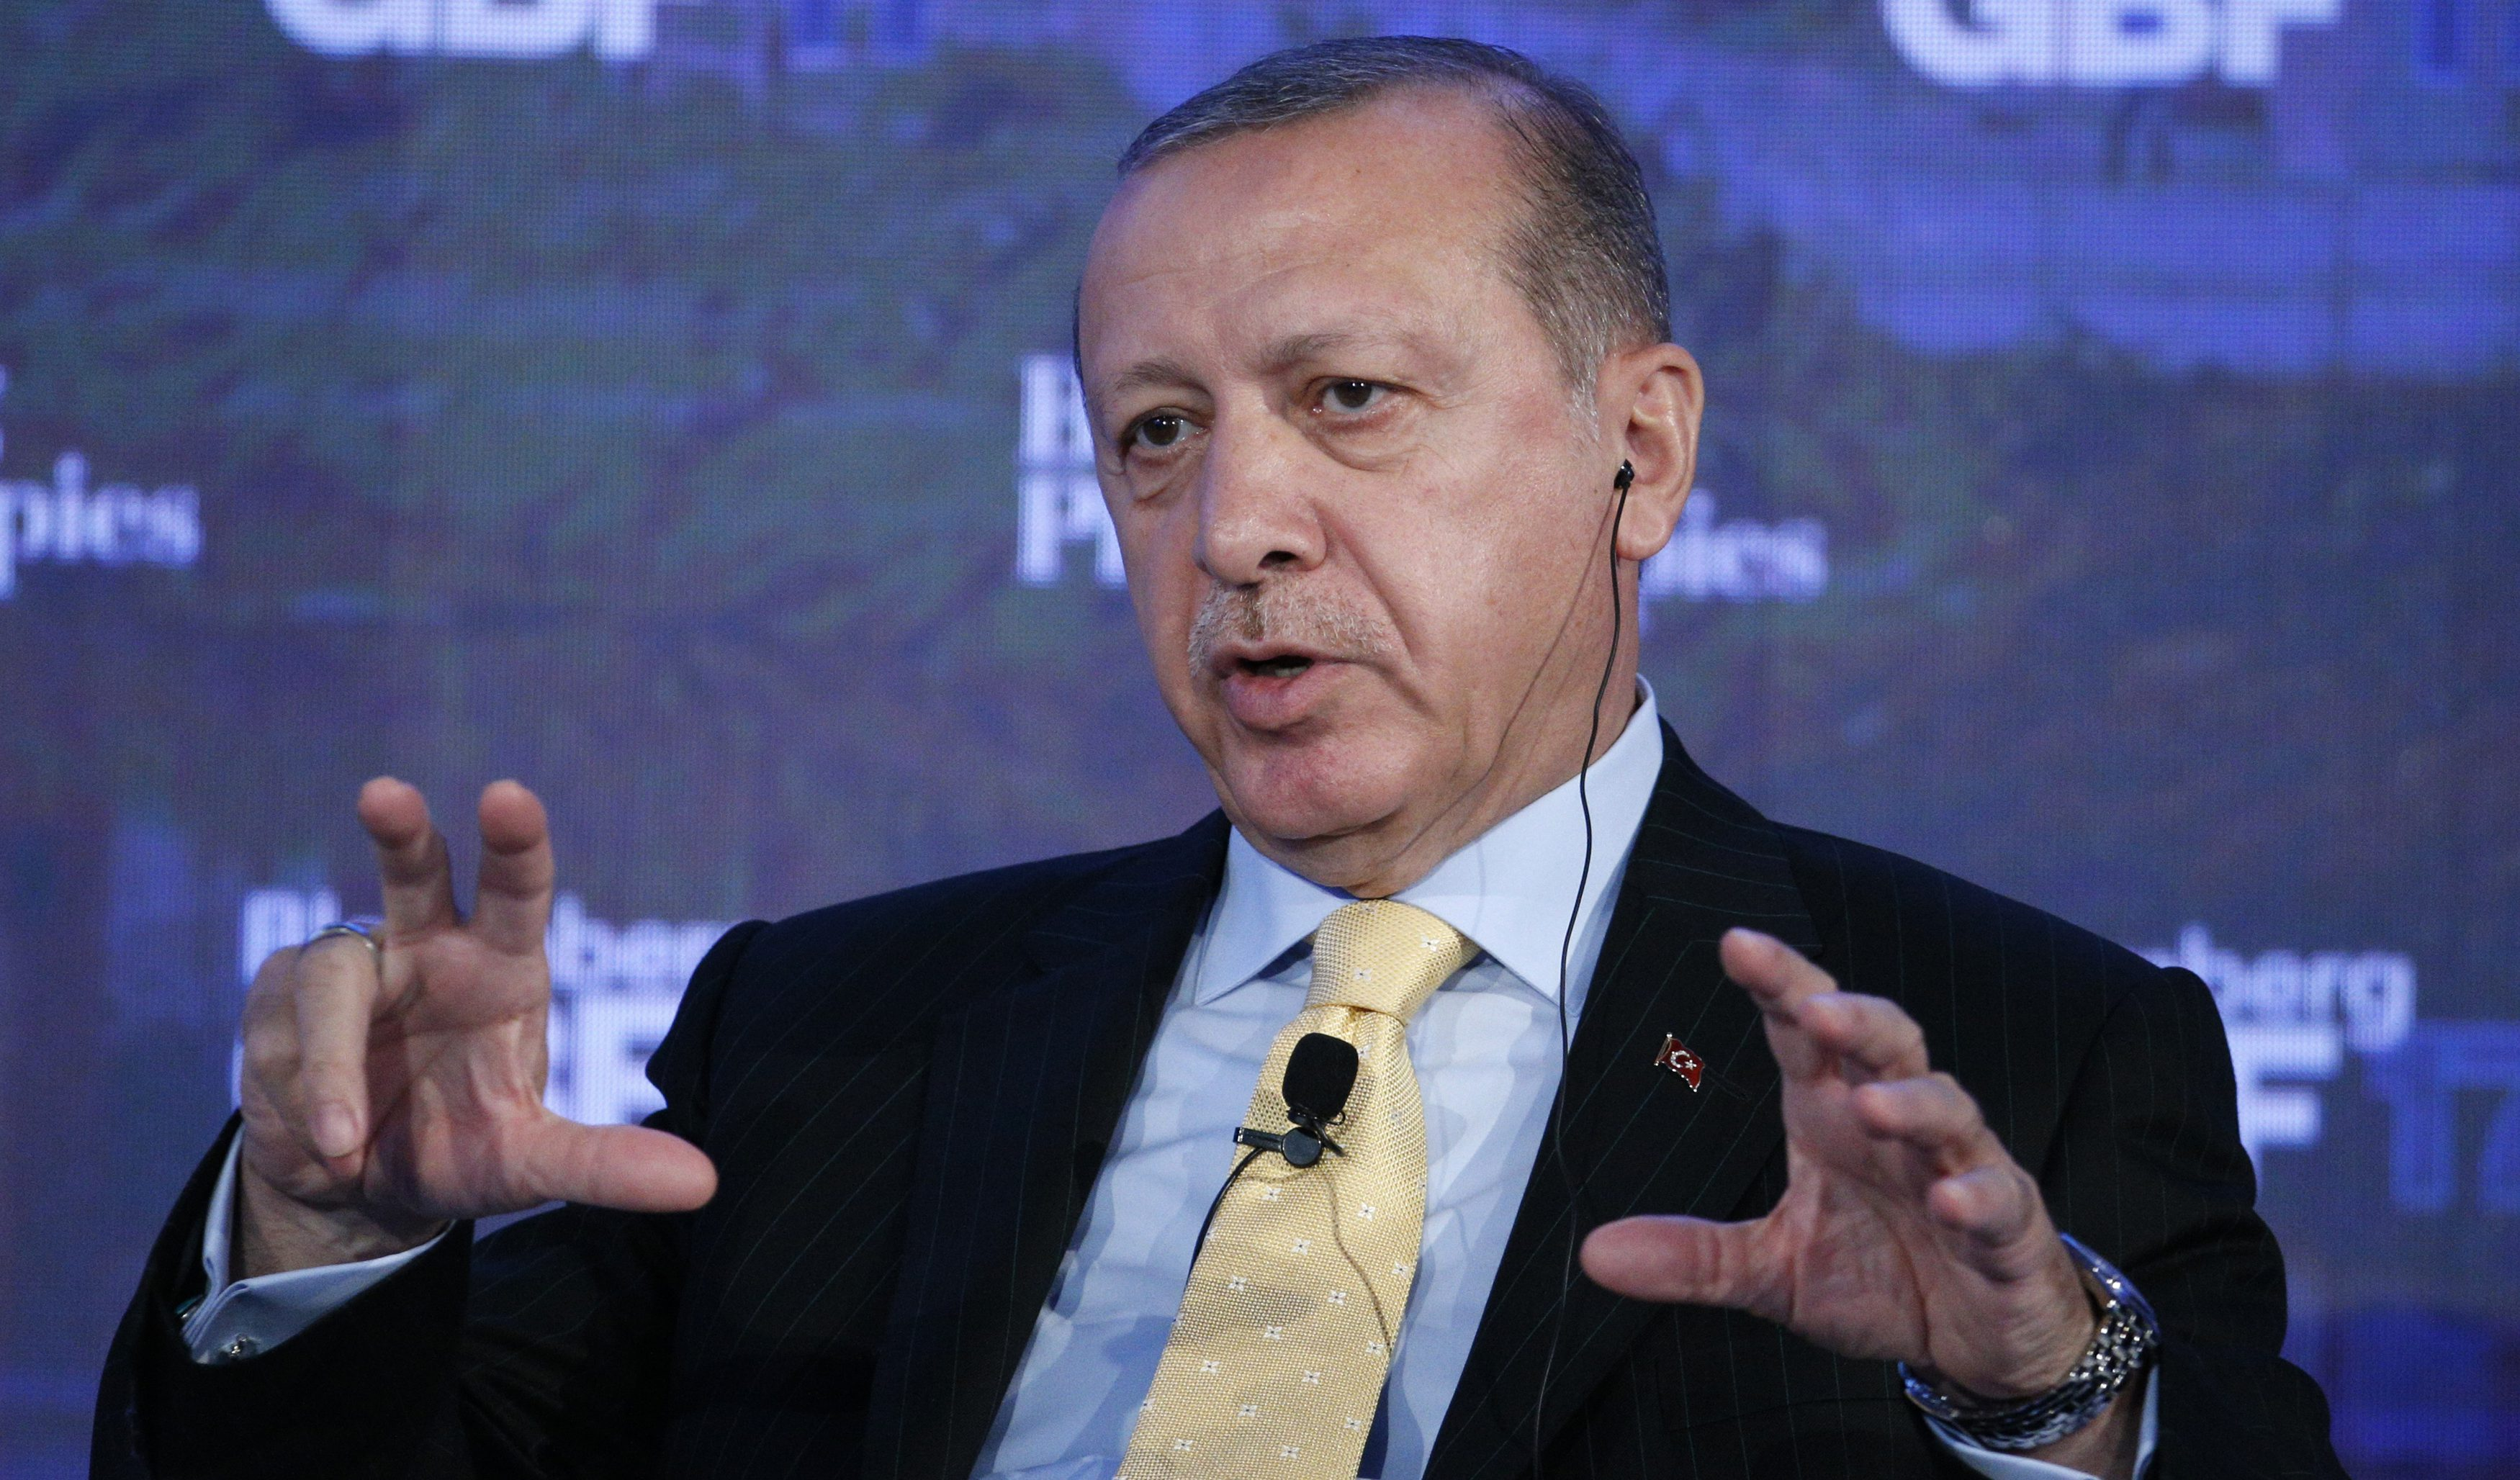 Turkish President Recep Tayyip Erdogan speaks at the Bloomberg Global Business Forum in New York, U.S., September 20, 2017. REUTERS/Brendan McDermid - HP1ED9K1COS2I